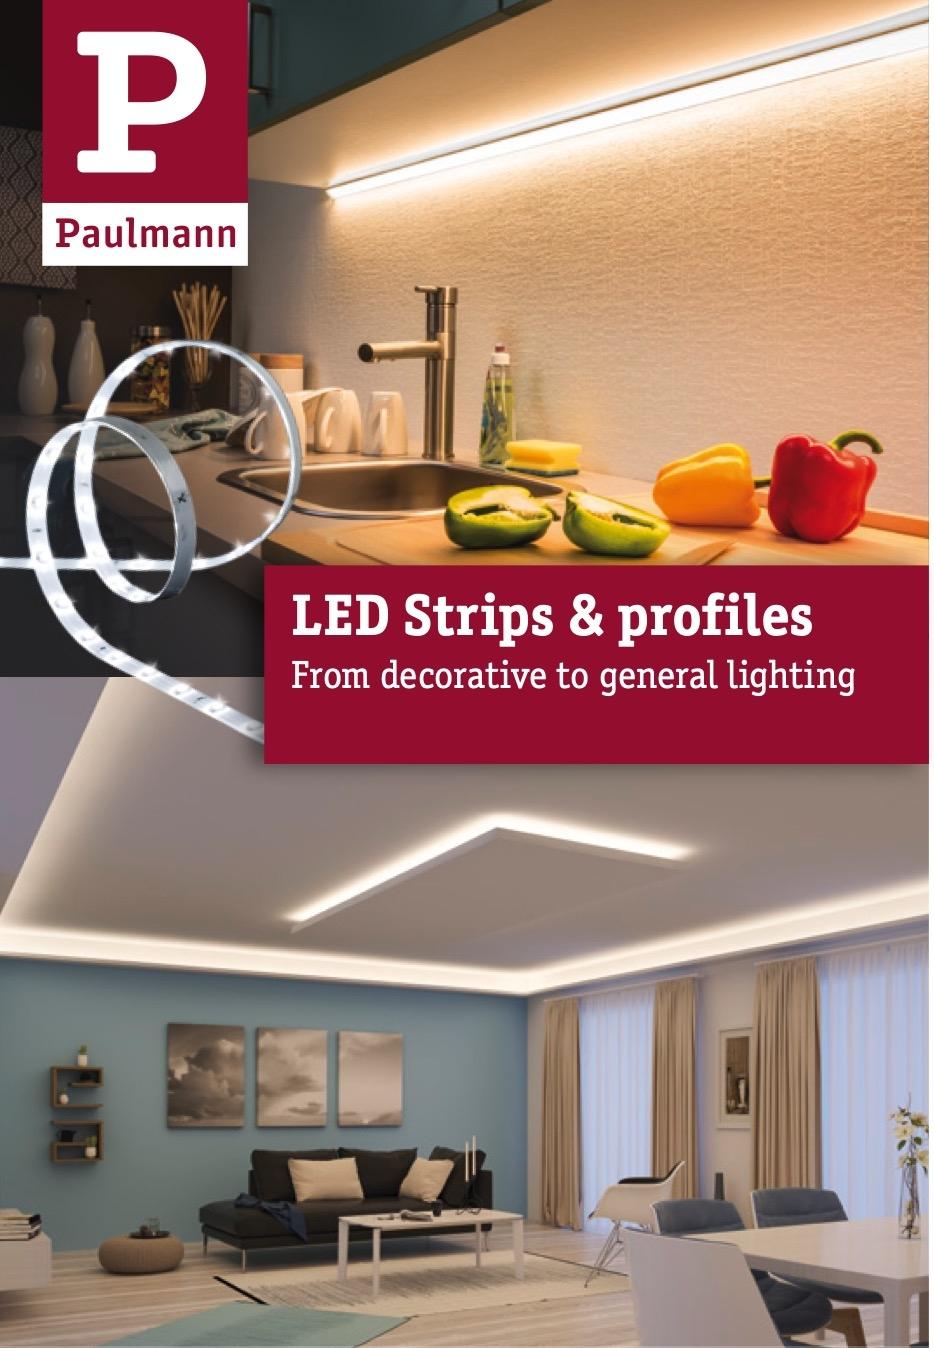 Paulmann LED Strips & profiles